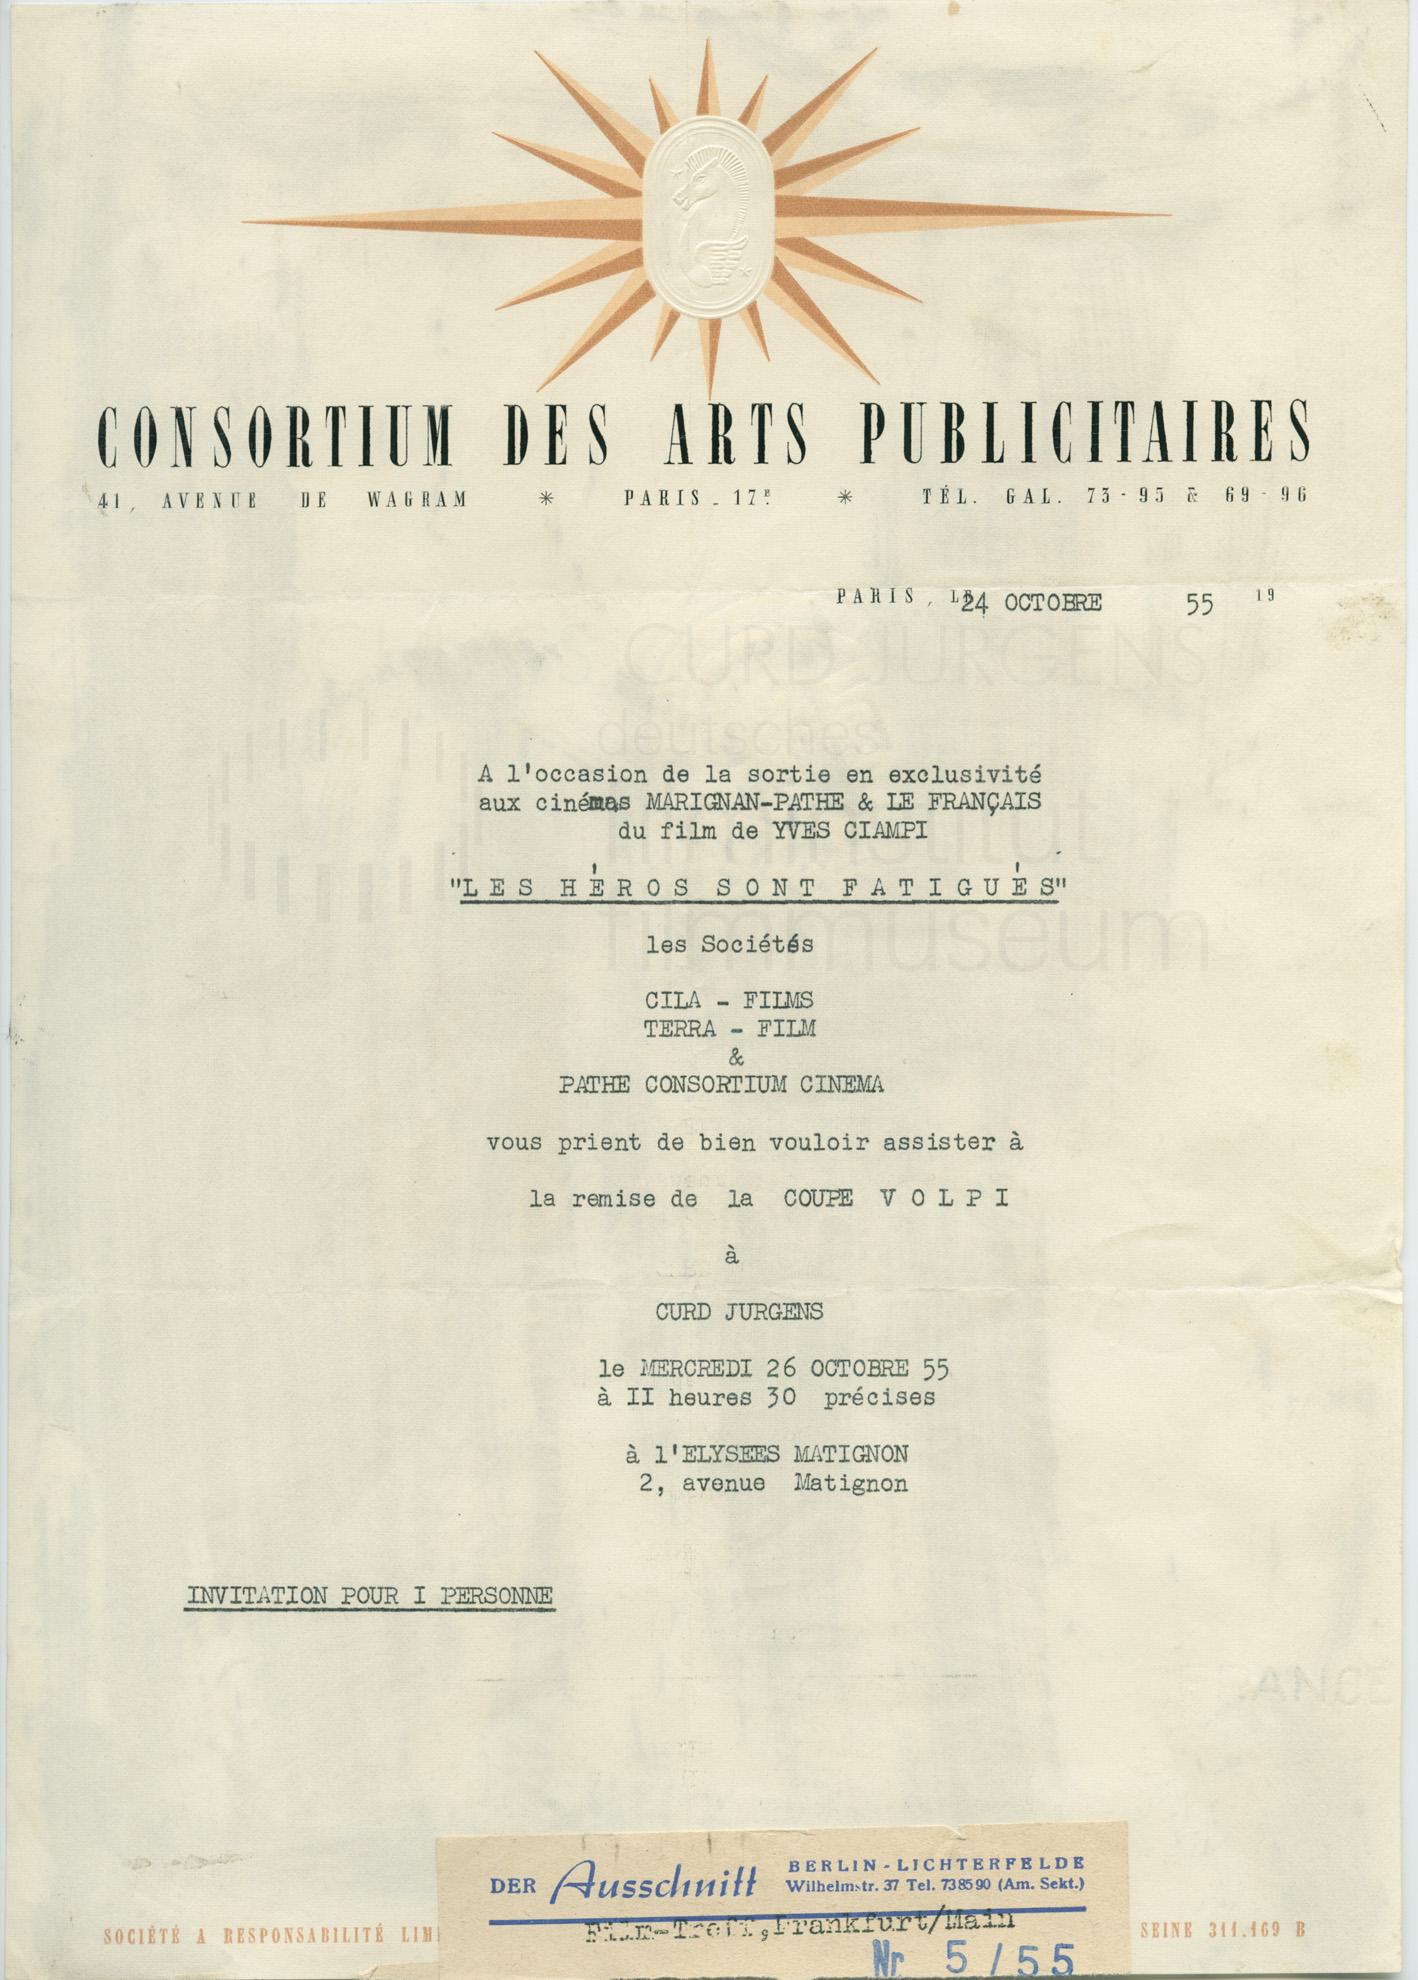 LES HÉROS SONT FATIGUÉS (1955) Einladung zur Verleihung des Coppa Volpi an Curd Jürgens